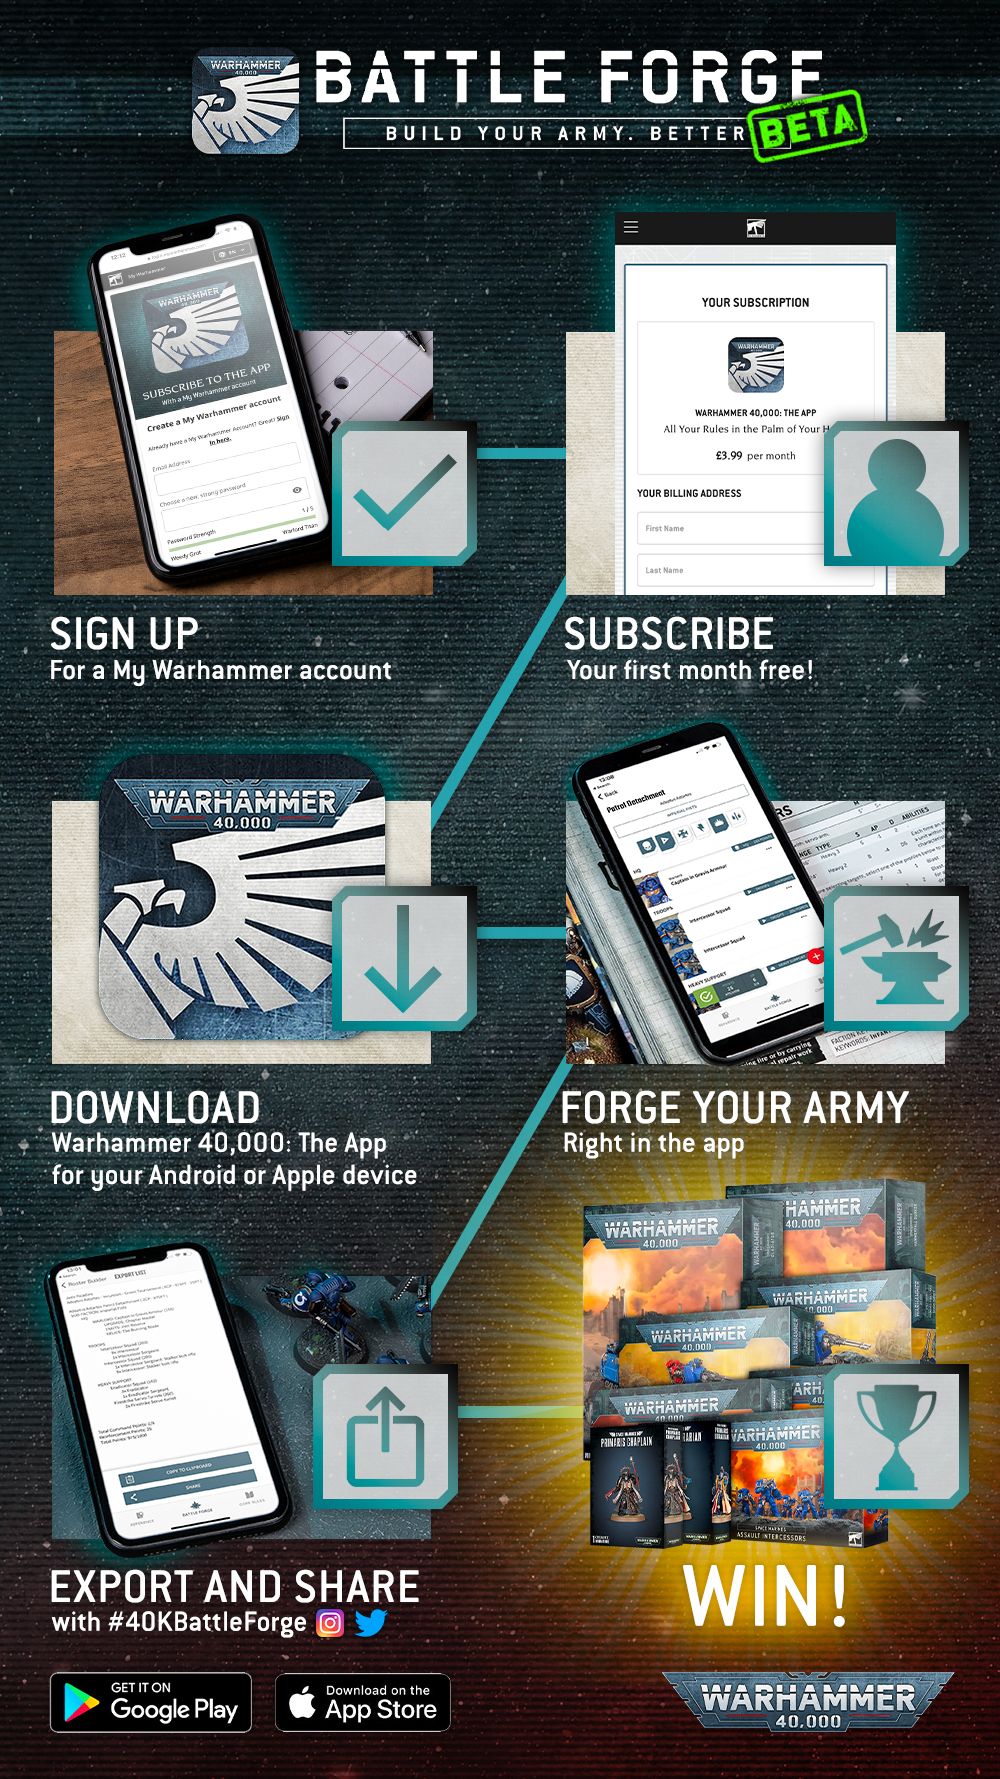 BattleForge Dec16 Infographic3sfe